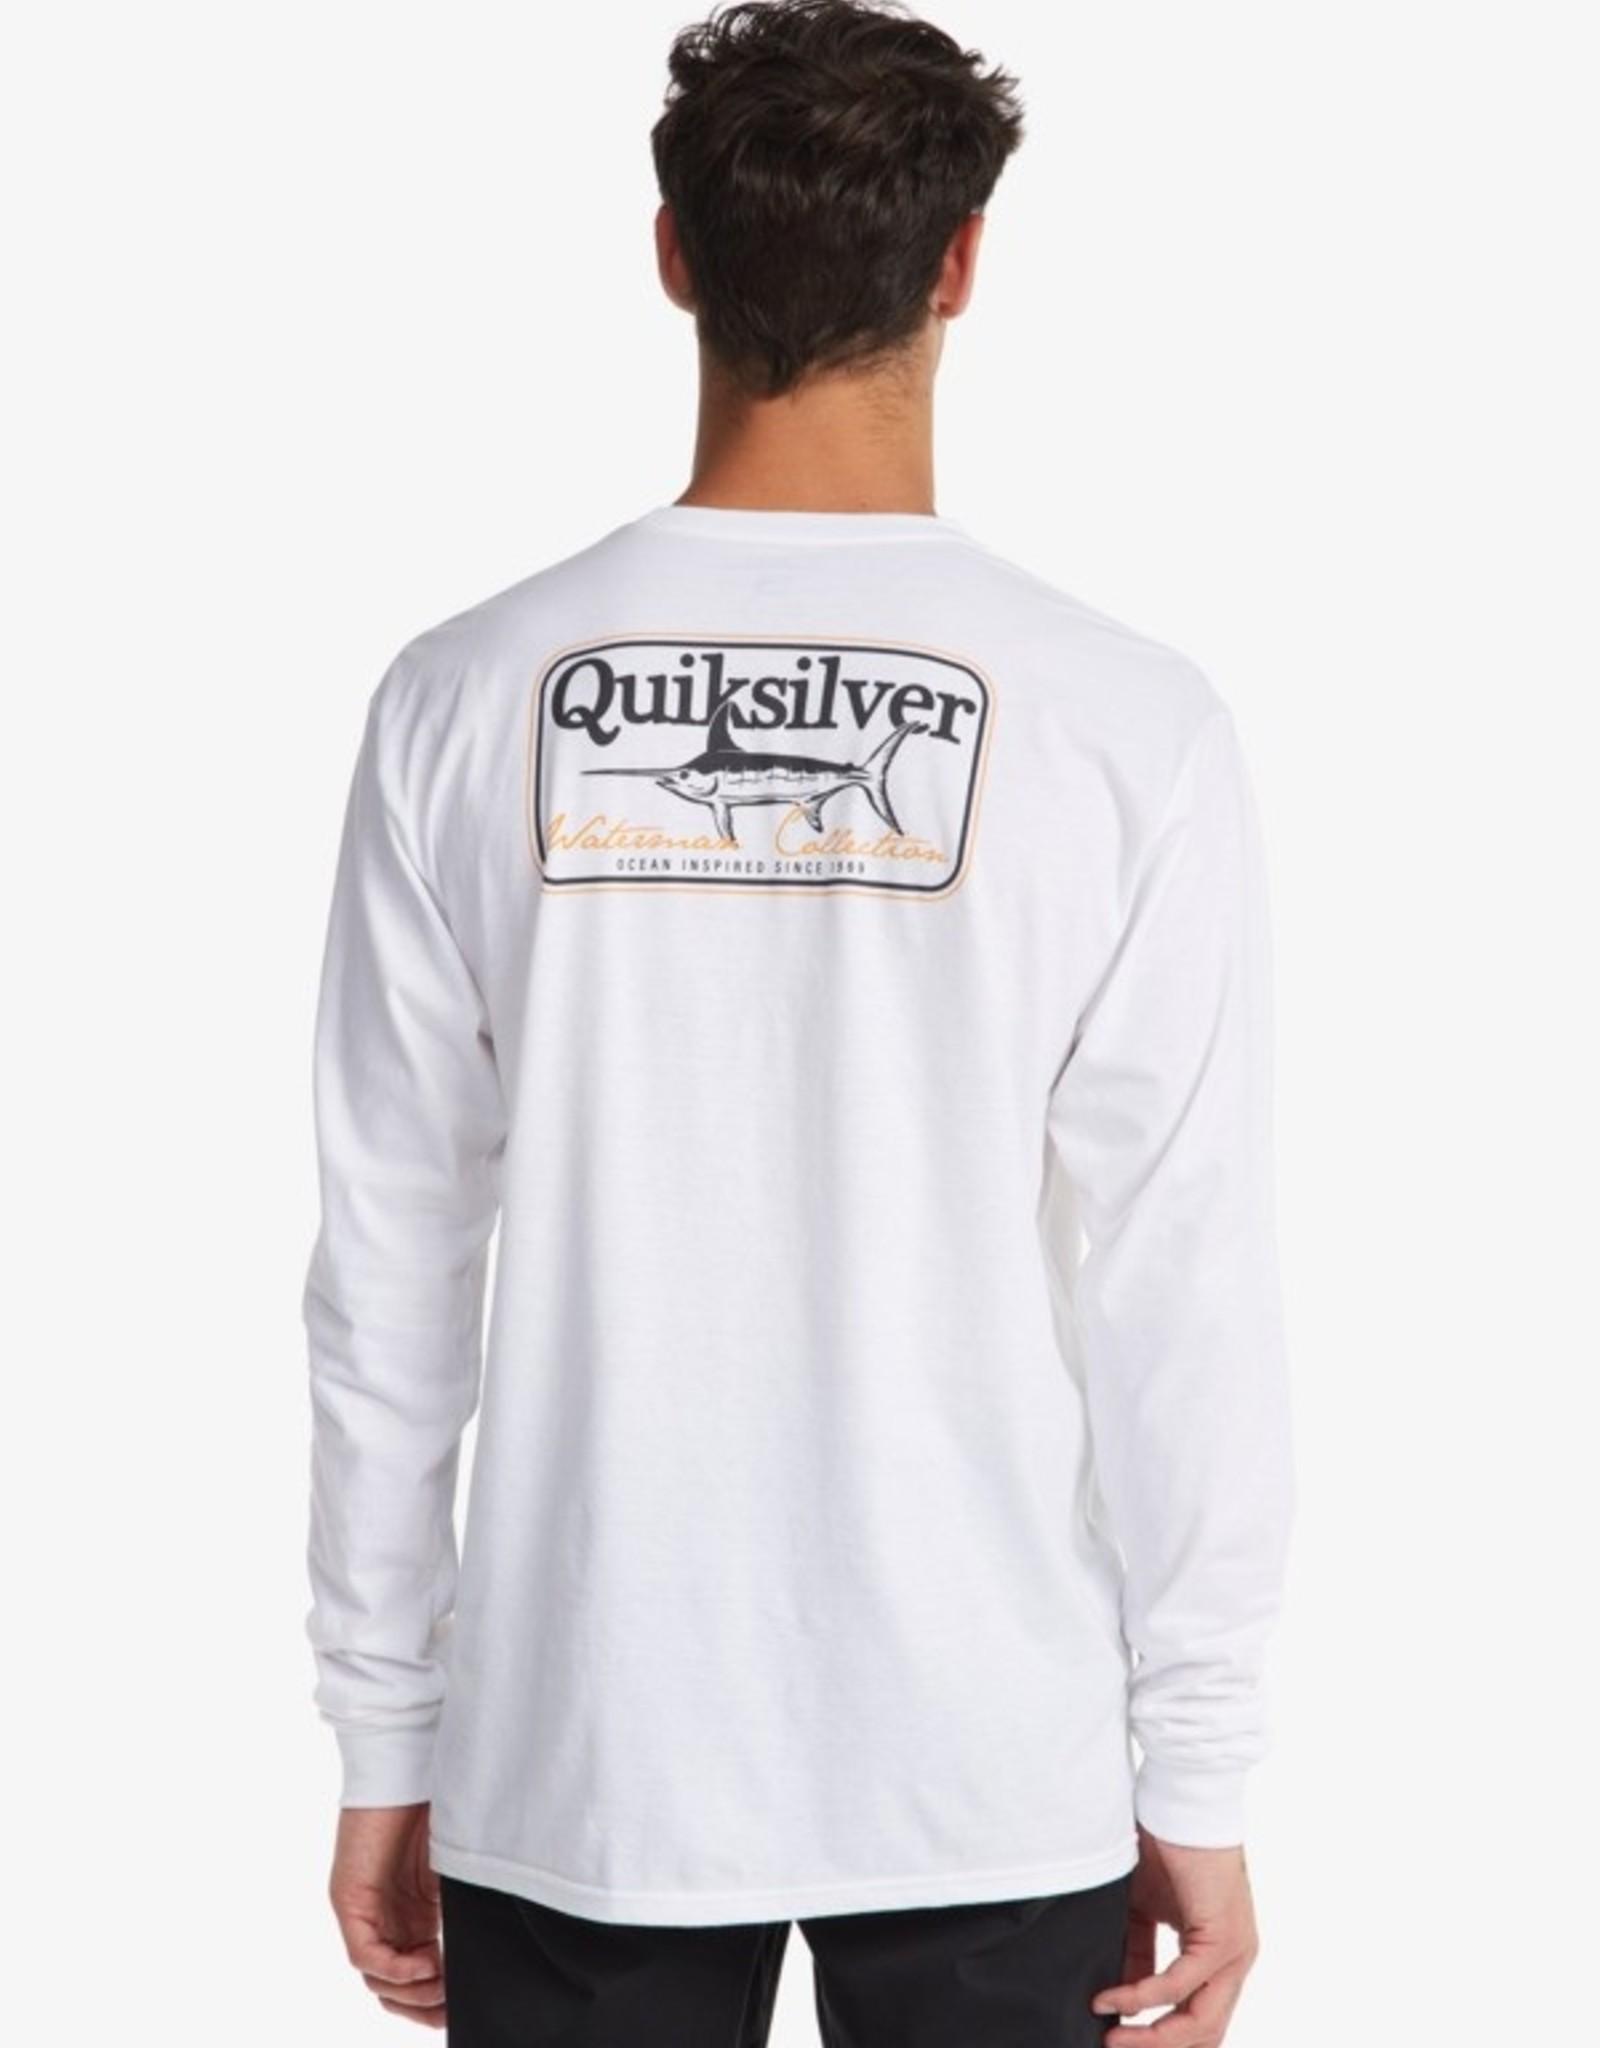 Quiksilver Night Fishing Long Sleeve Tee